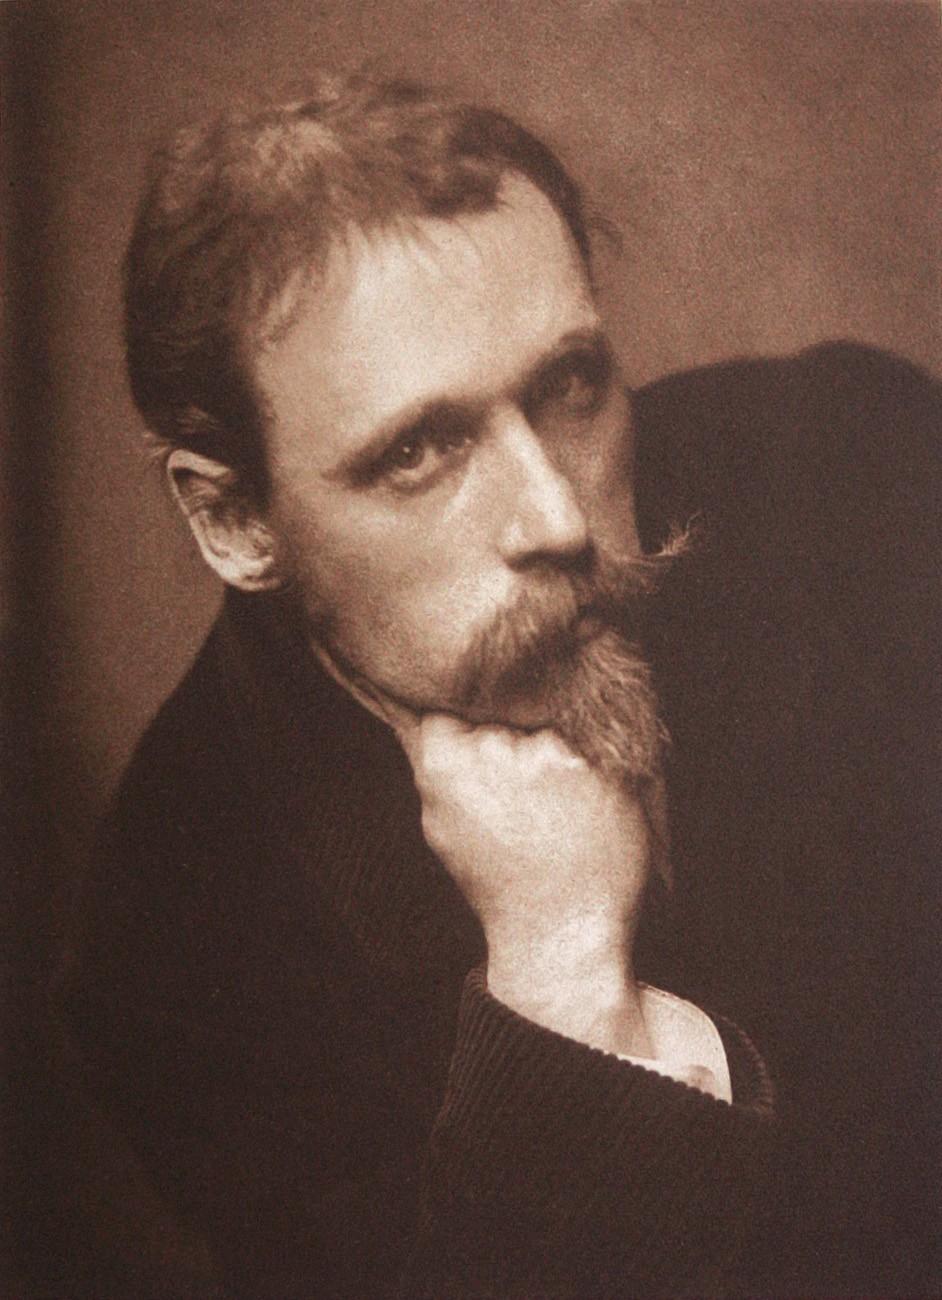 Walter_Crane_1902